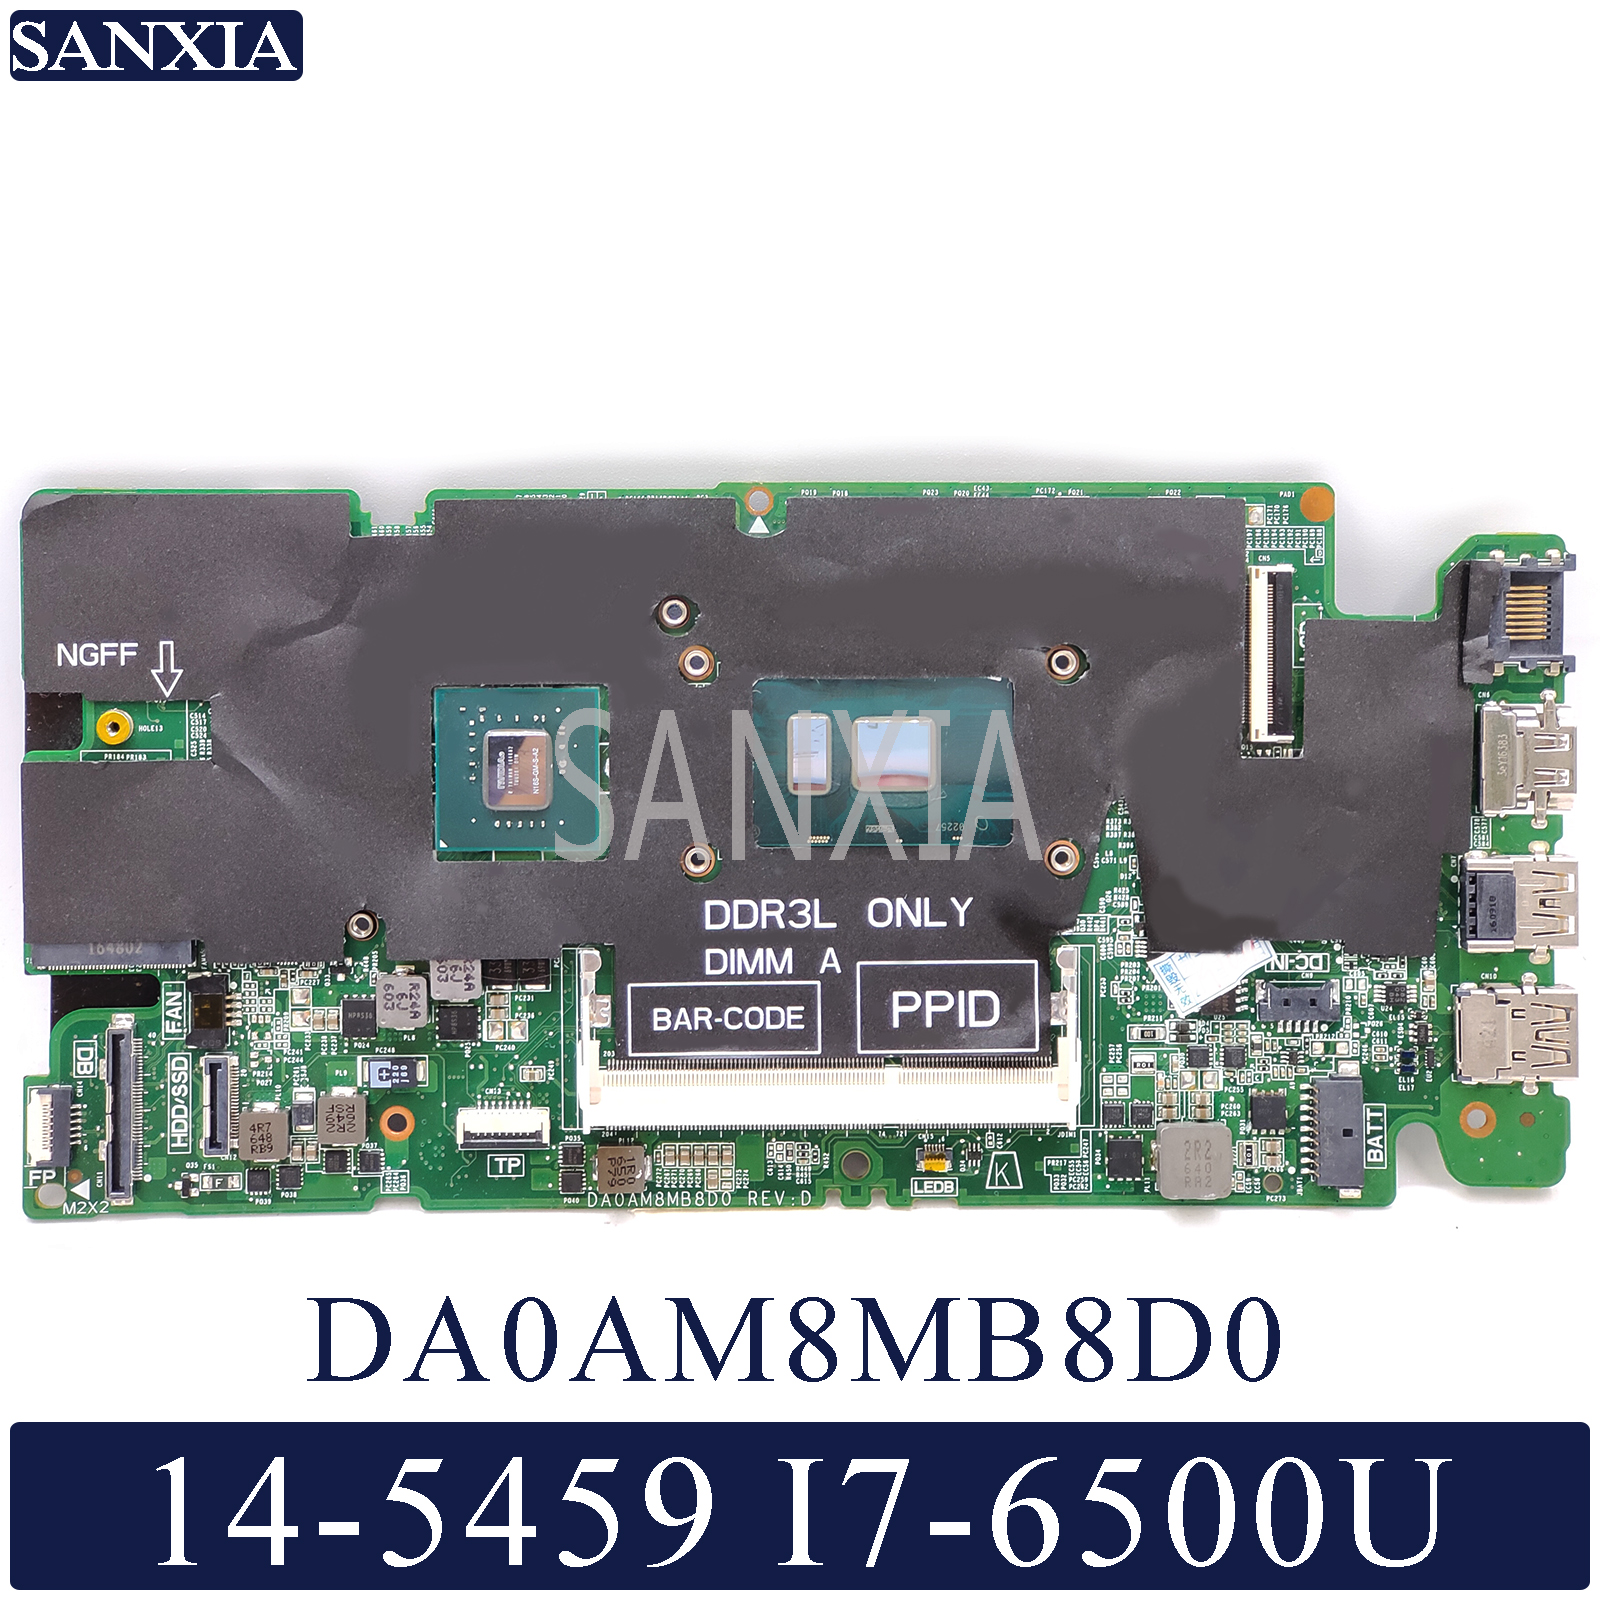 KEFU DA0AM8MB8D0 Laptop Motherboard For Dell Vostro 14-5459 Original Mainboard I7-6500U GT930M